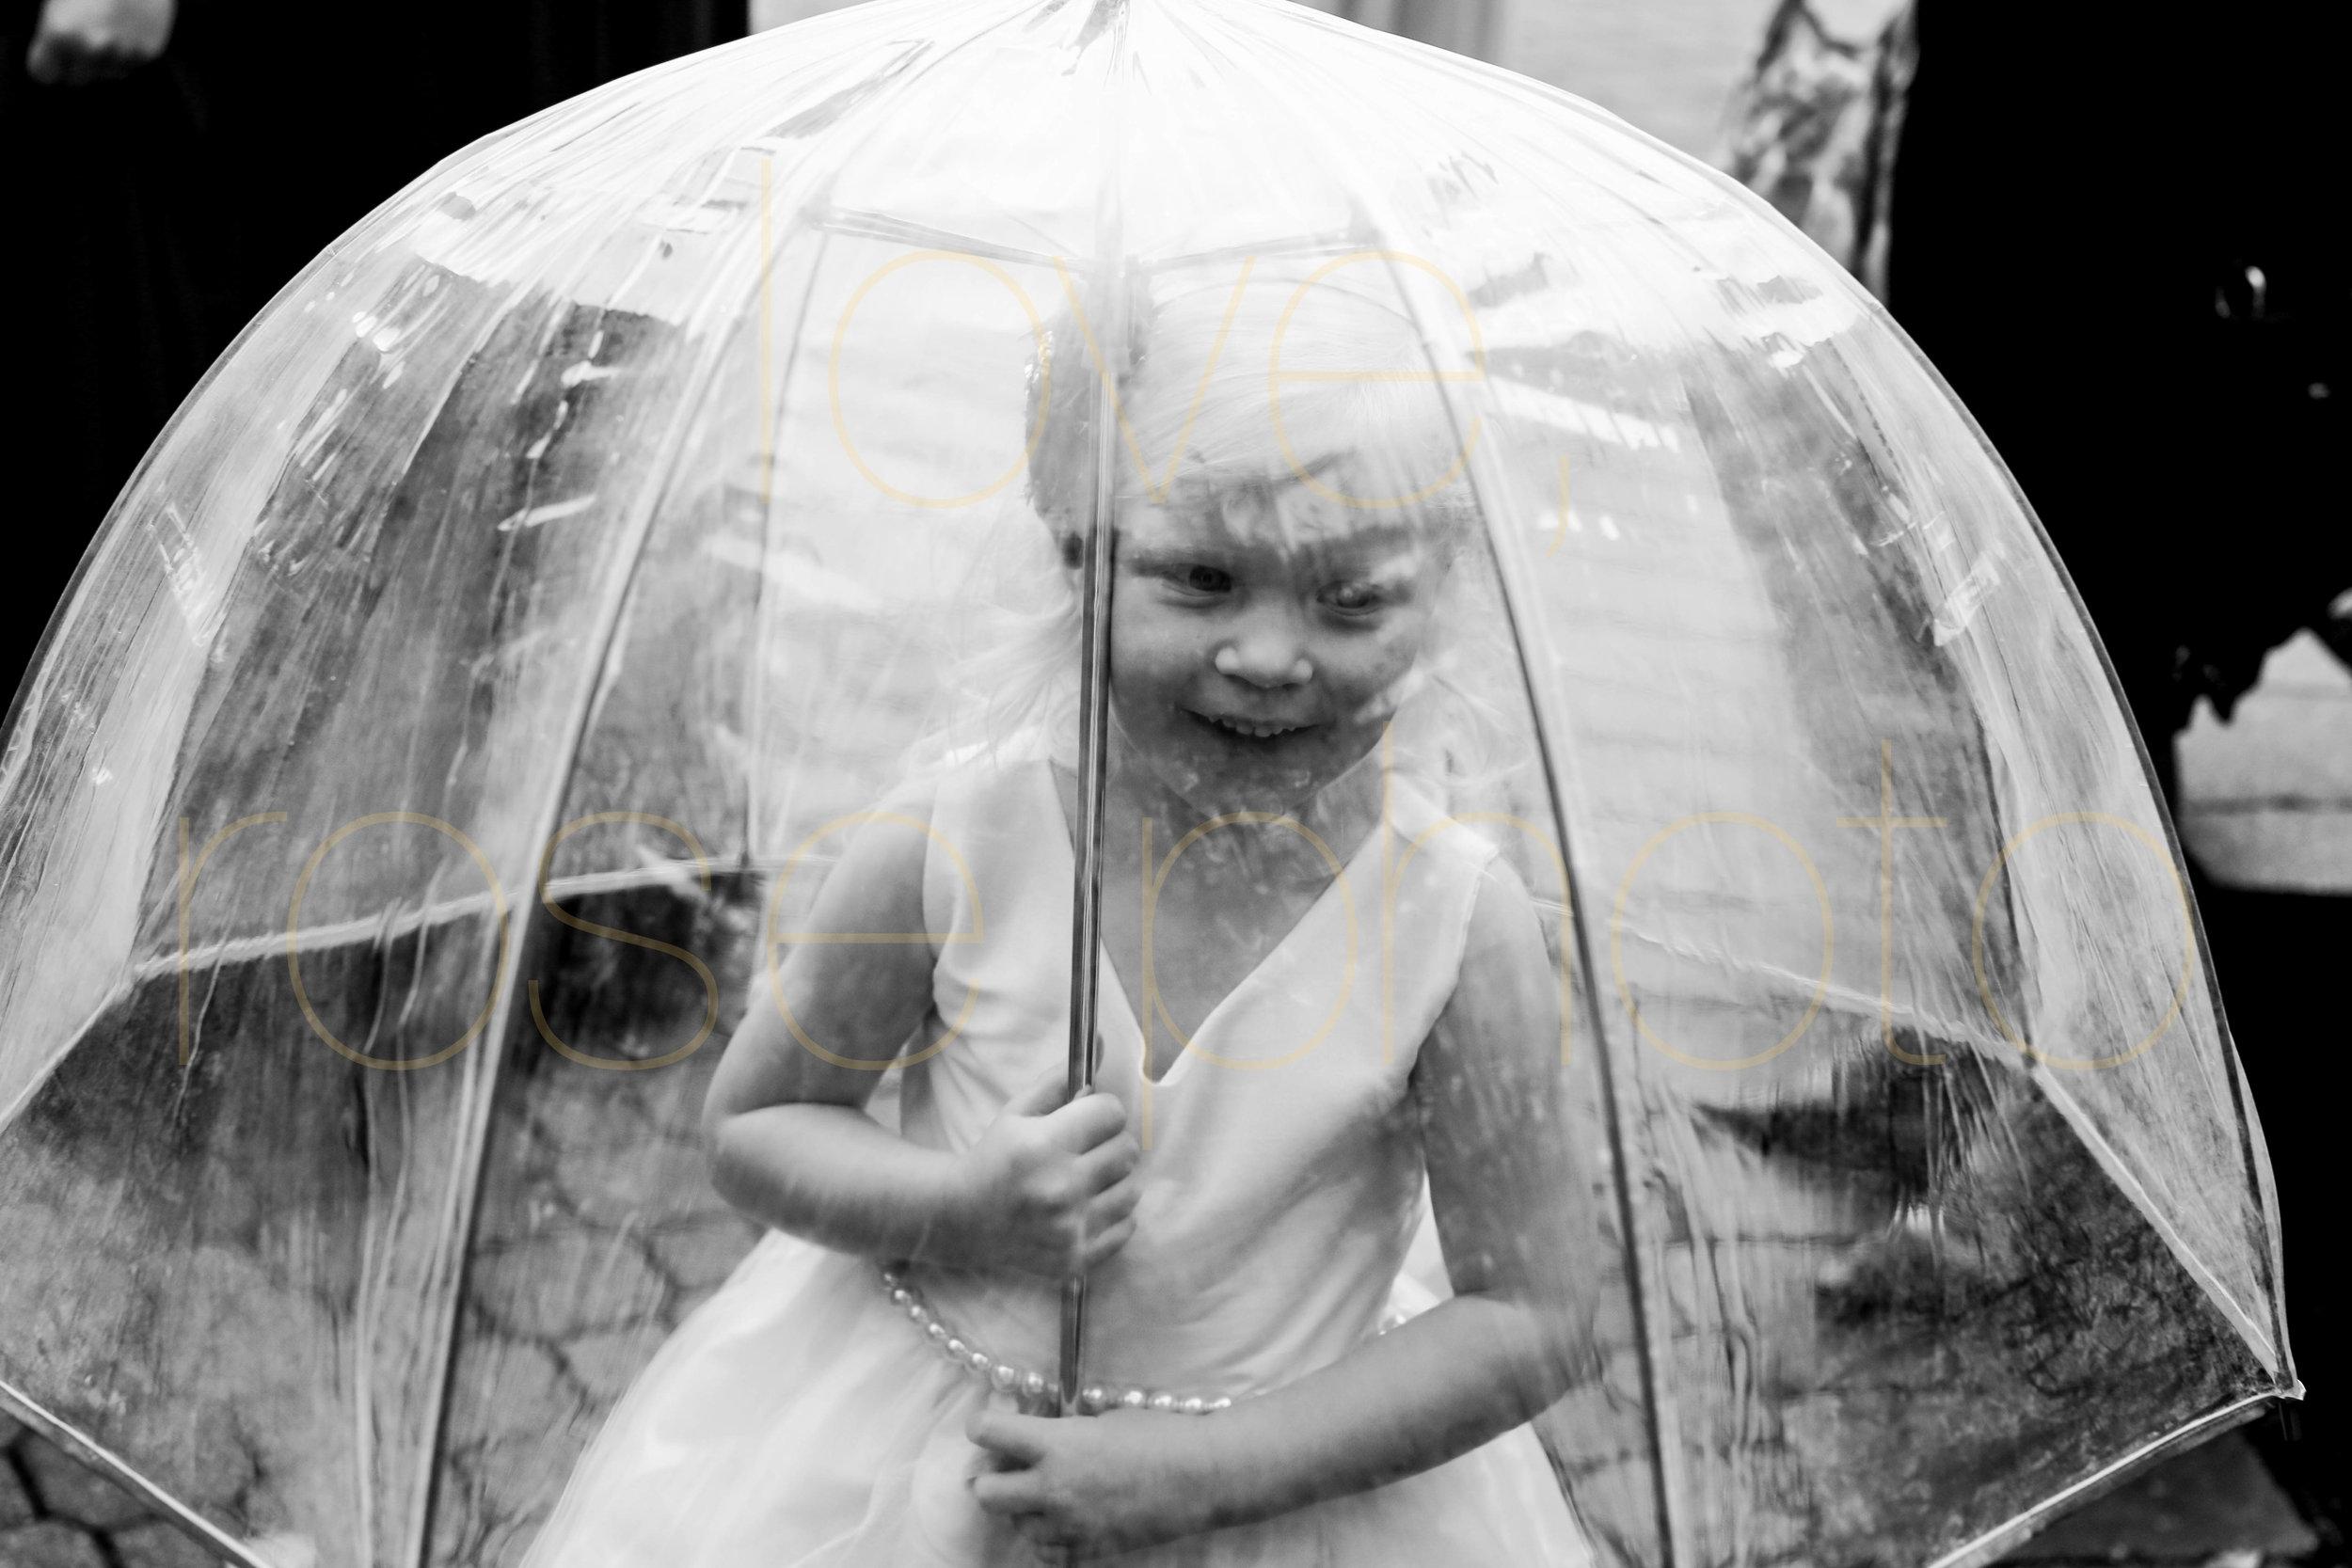 Alison + Mike Chicago Wedding Photographer Blog -16.jpg